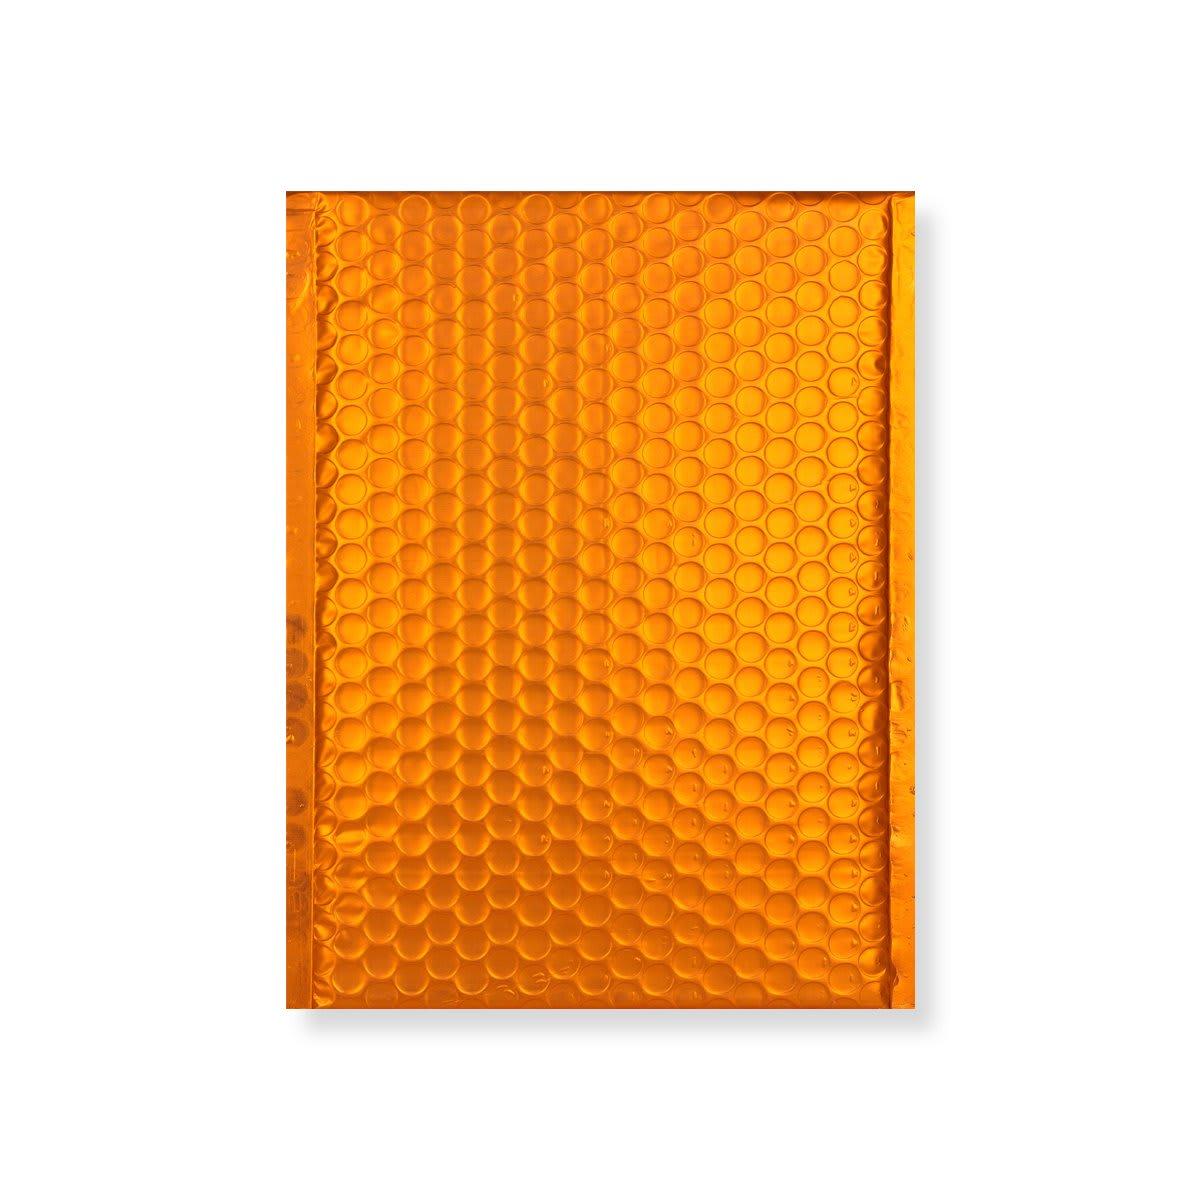 C5 + MATT METALLIC ORANGE PADDED ENVELOPES (250 x 180MM)